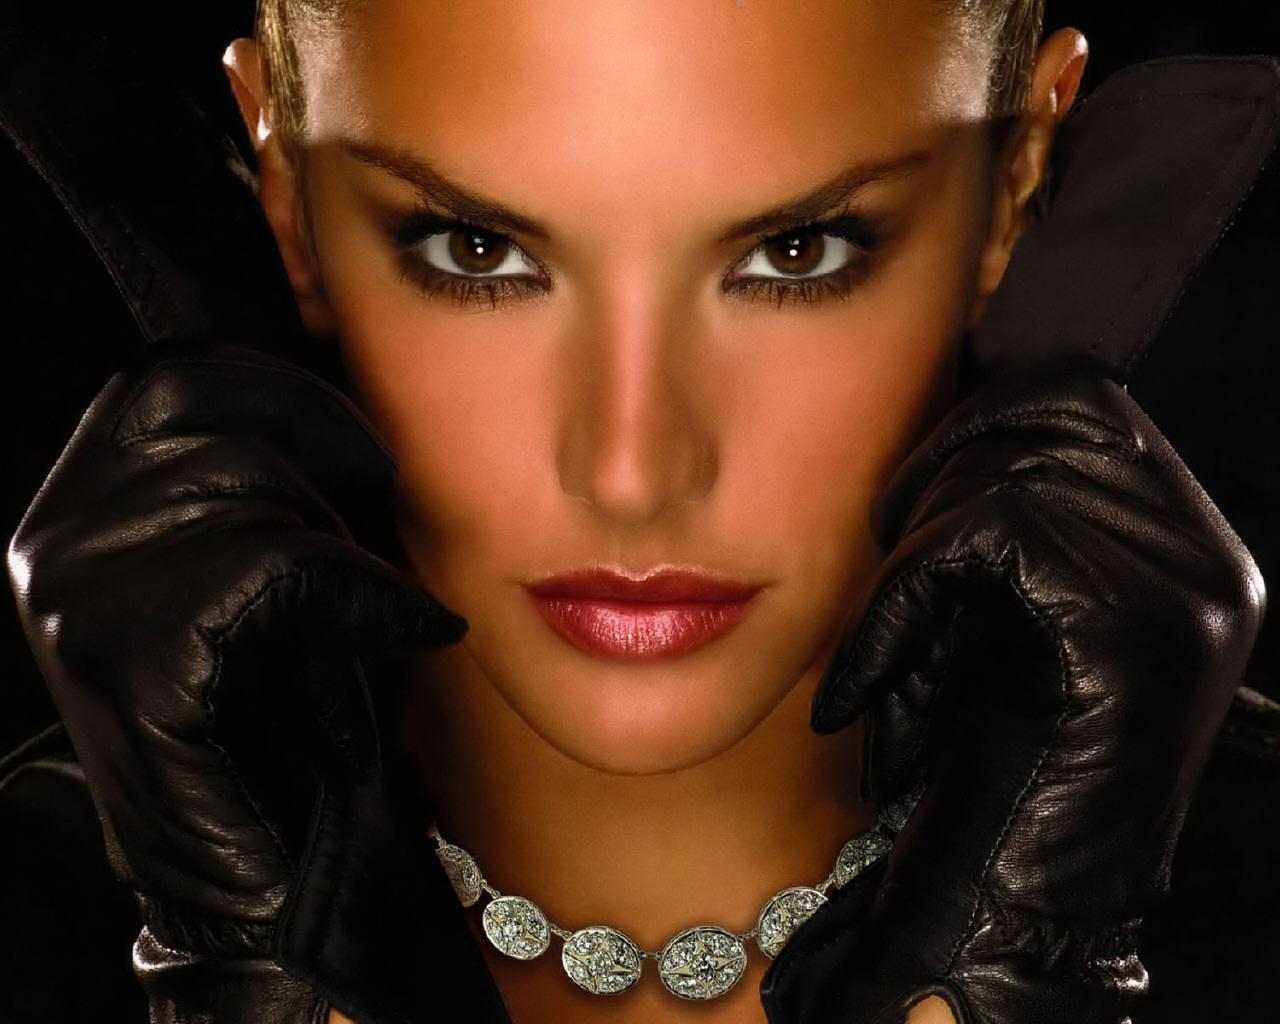 http://3.bp.blogspot.com/-4S0-UhP-i2M/T2FtmokQzNI/AAAAAAAAAbk/IjG2L_gQYSk/s1600/270_Alessandra_Ambrosio_photo_3.jpg